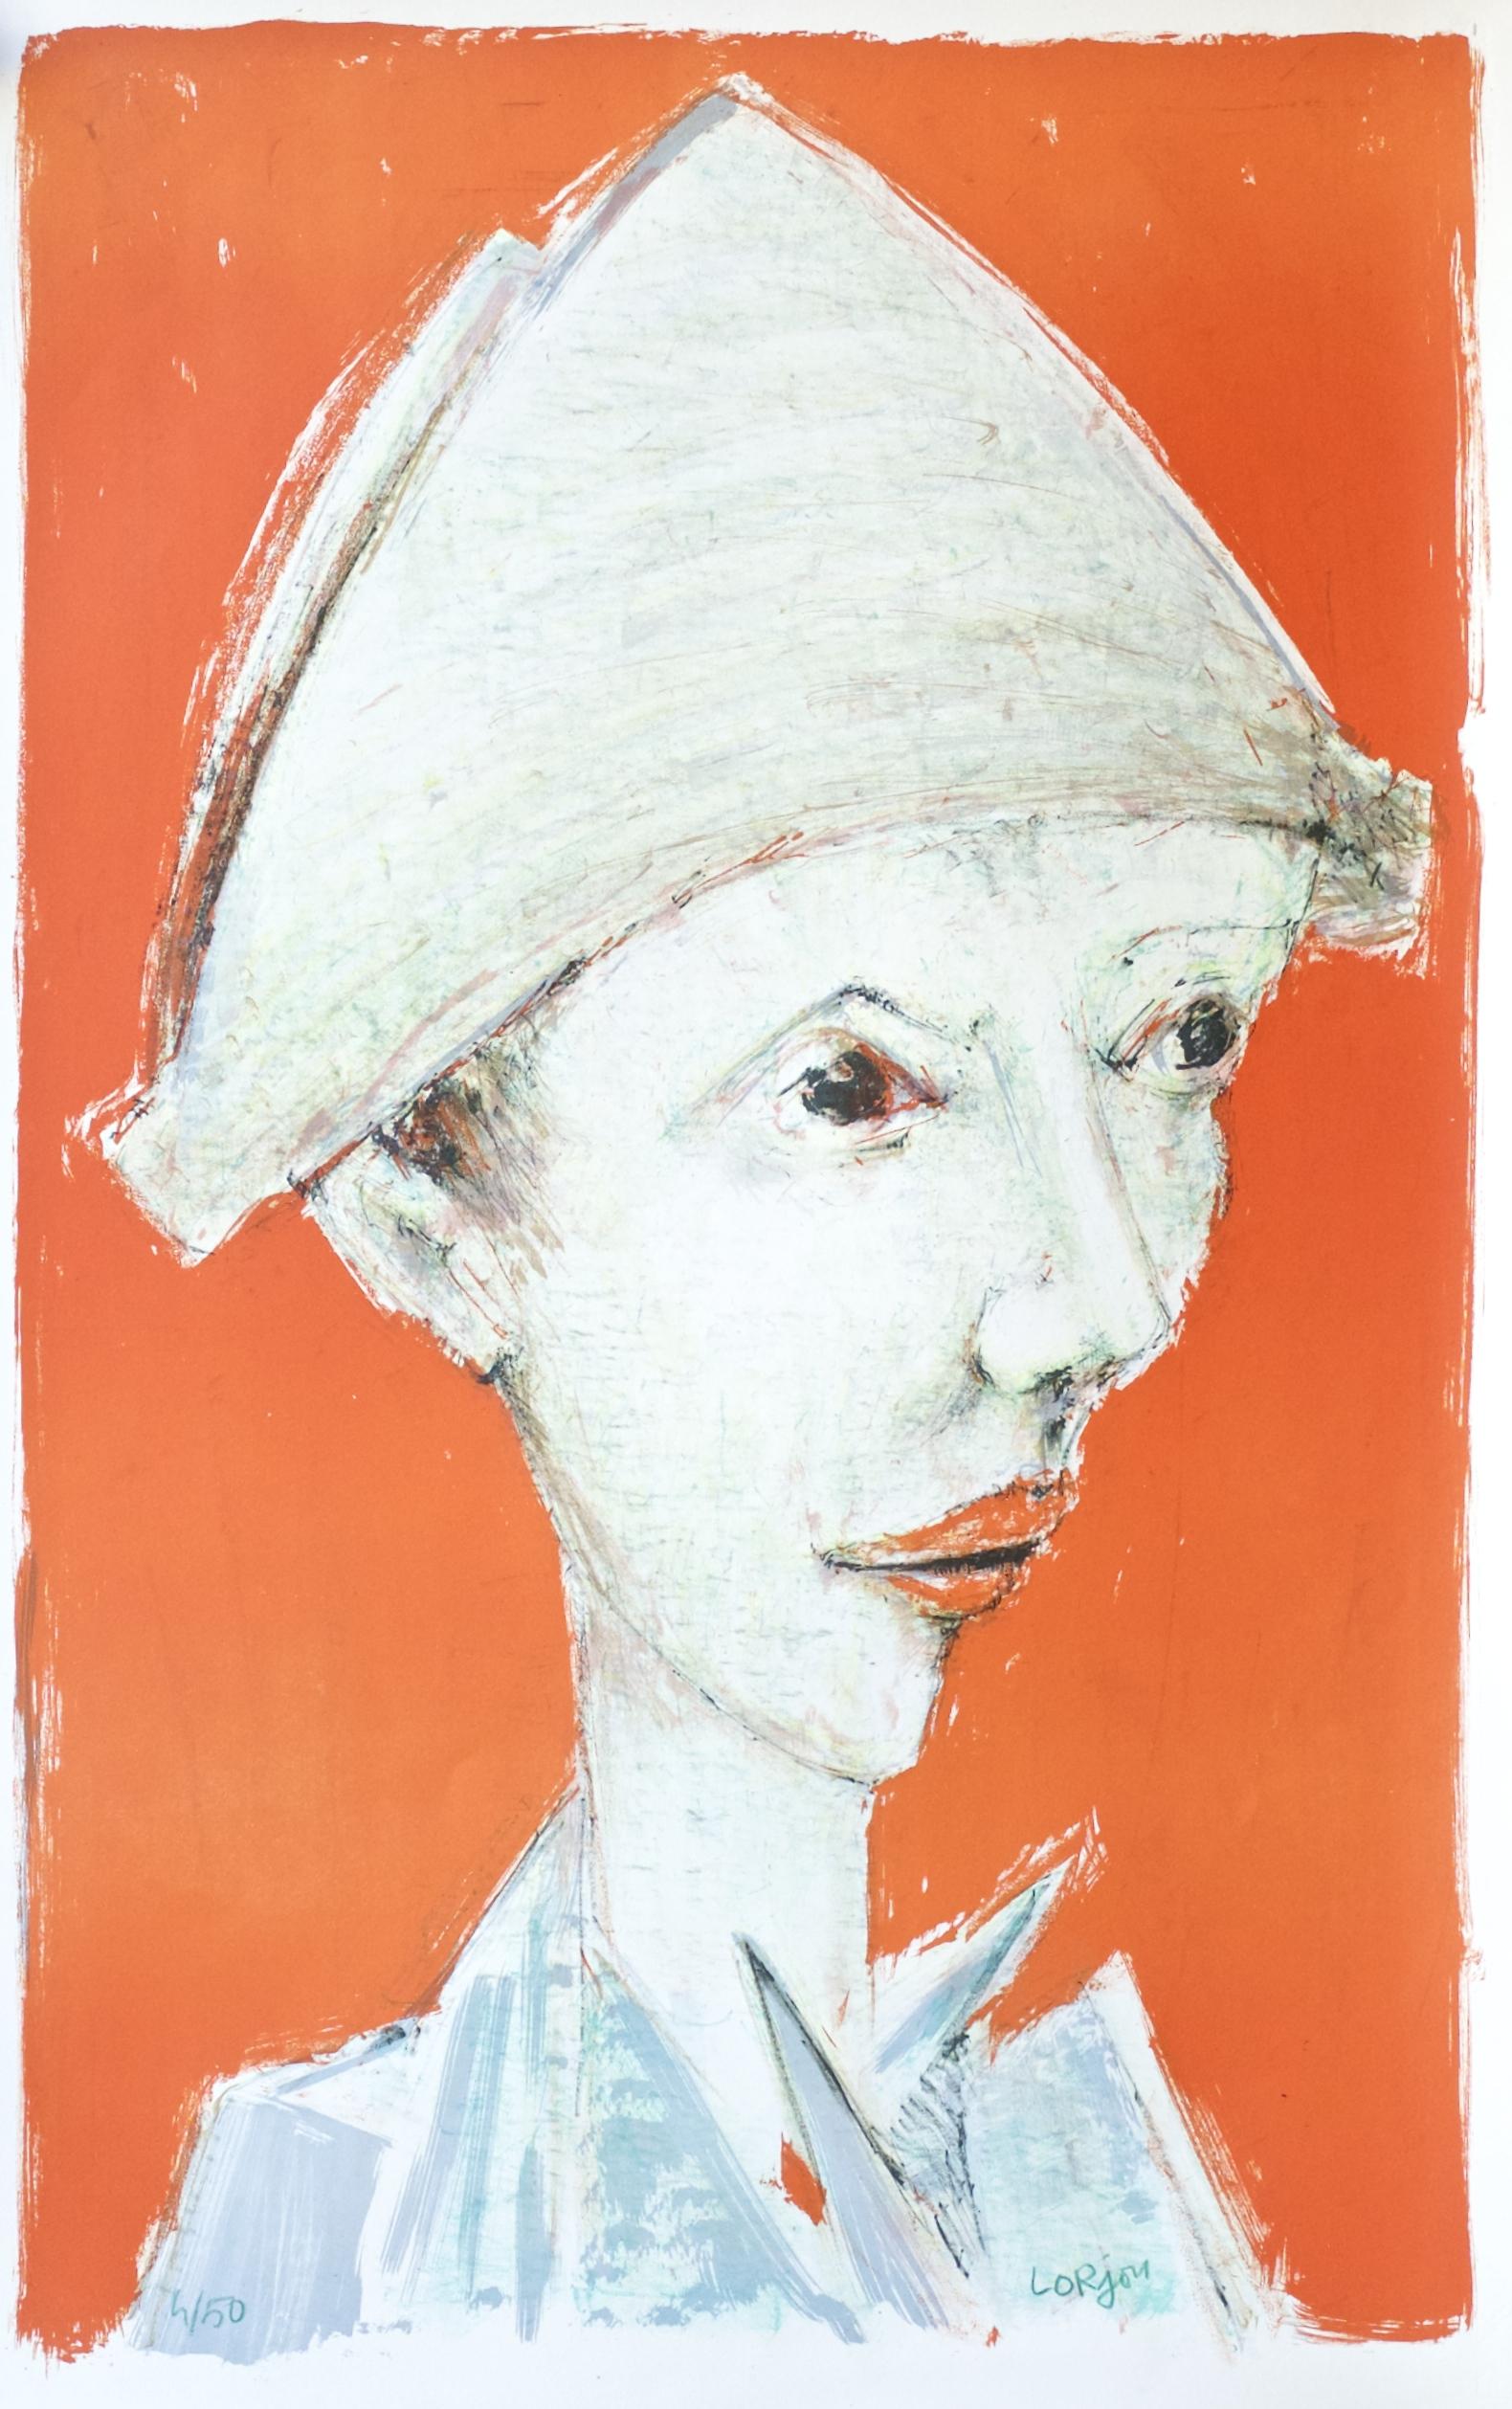 Harequin Profile in Orange (Profil Droit d'Arlequin Fond Orange) (1959)